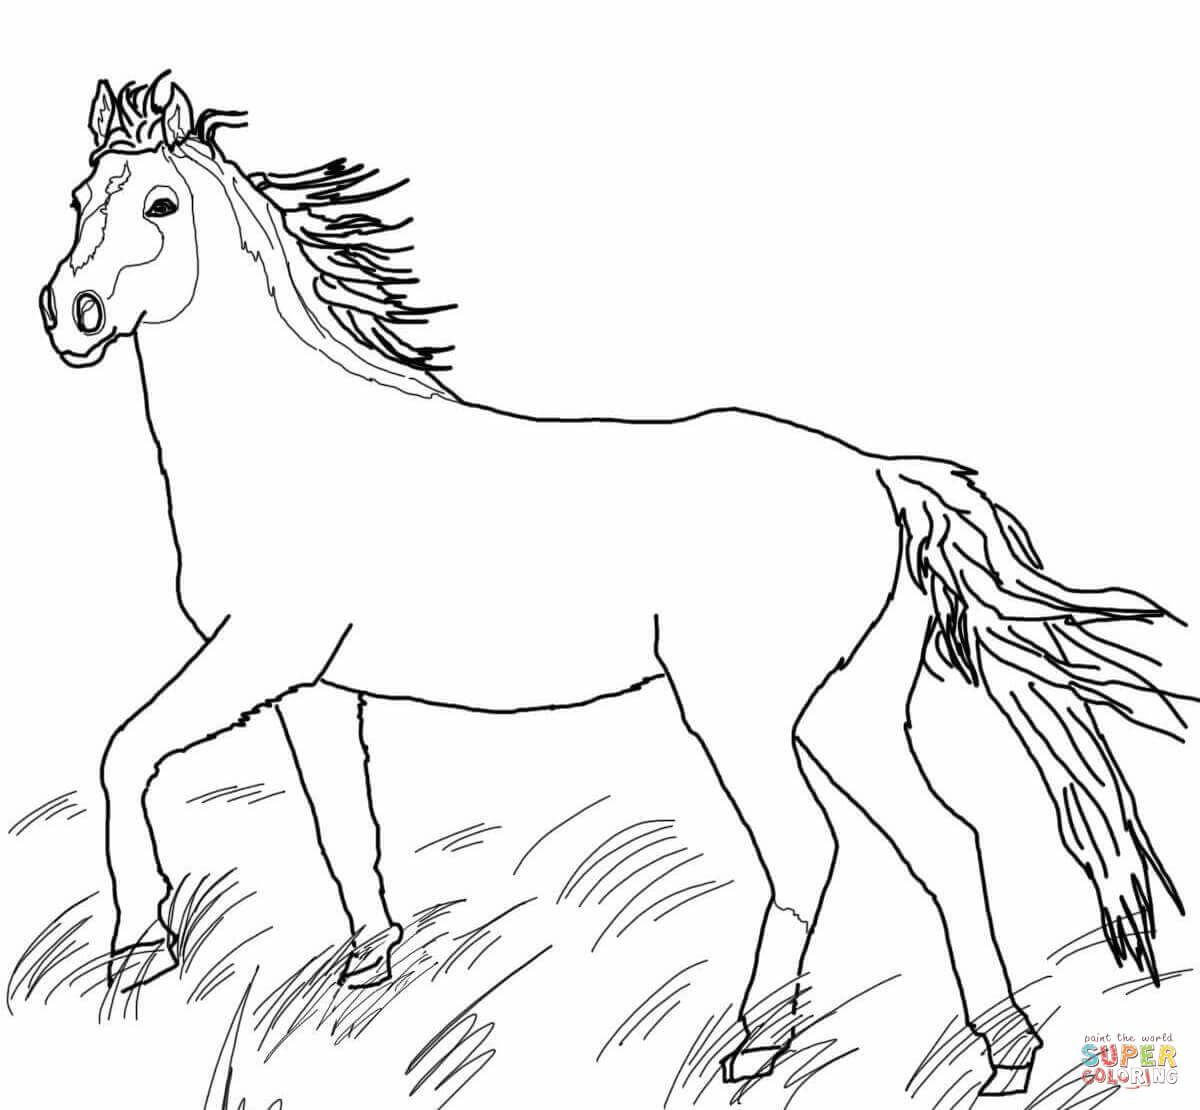 Mustang Caballo Cimarron Super Coloring Paginas Para Colorear Mustang Caballos Mustang [ 1110 x 1200 Pixel ]